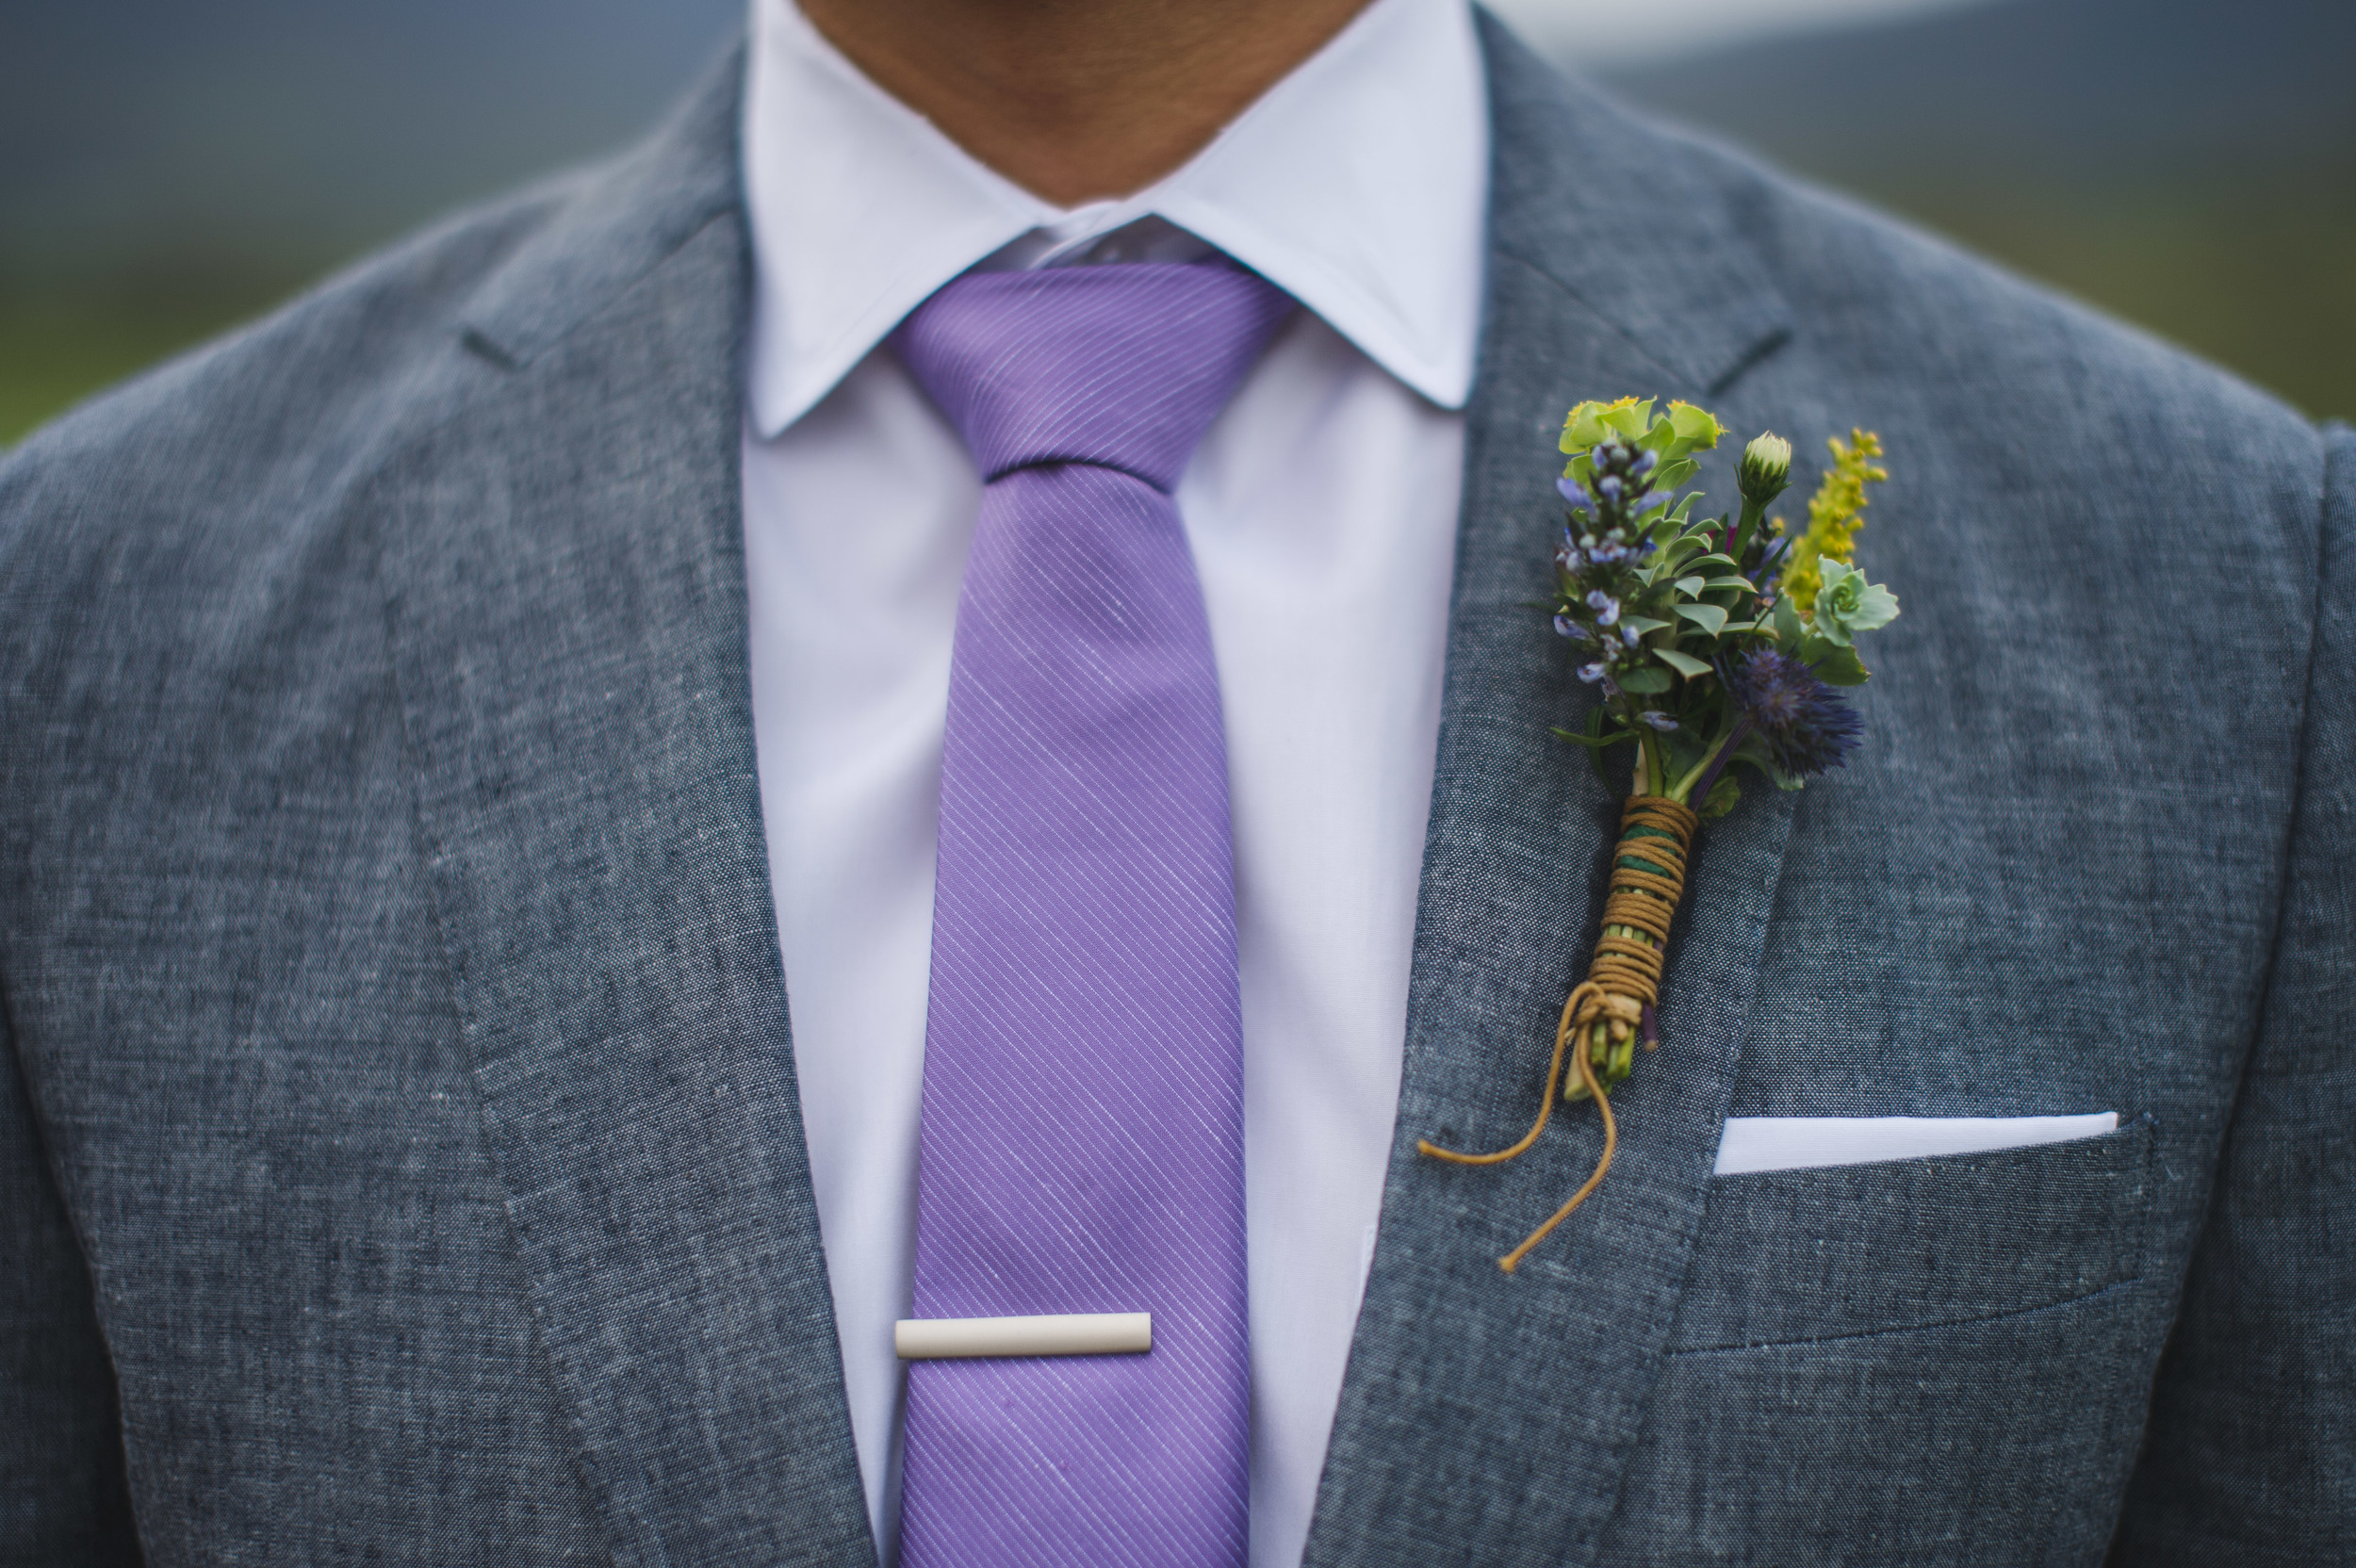 Photojournalistic wedding photography Baltimore MD By Mantas Kubilinskas-6.jpg